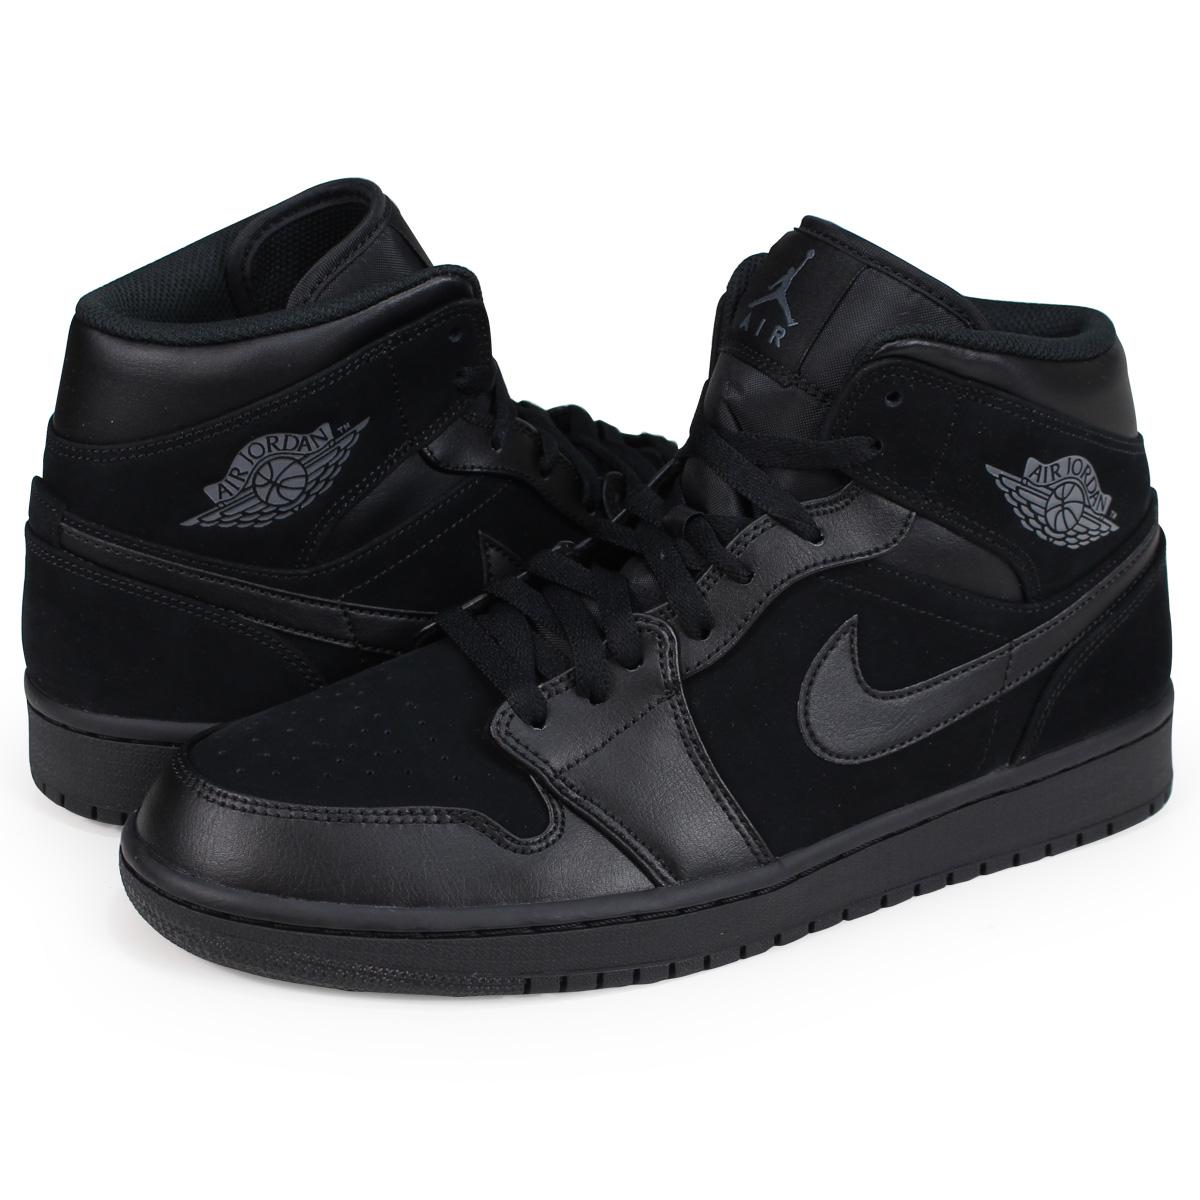 huge discount 1ae20 fc45c NIKE AIR JORDAN 1 MID Nike Air Jordan 1 sneakers men 554,724-050 black  [load planned Shinnyu load in reservation product 8/3 containing]